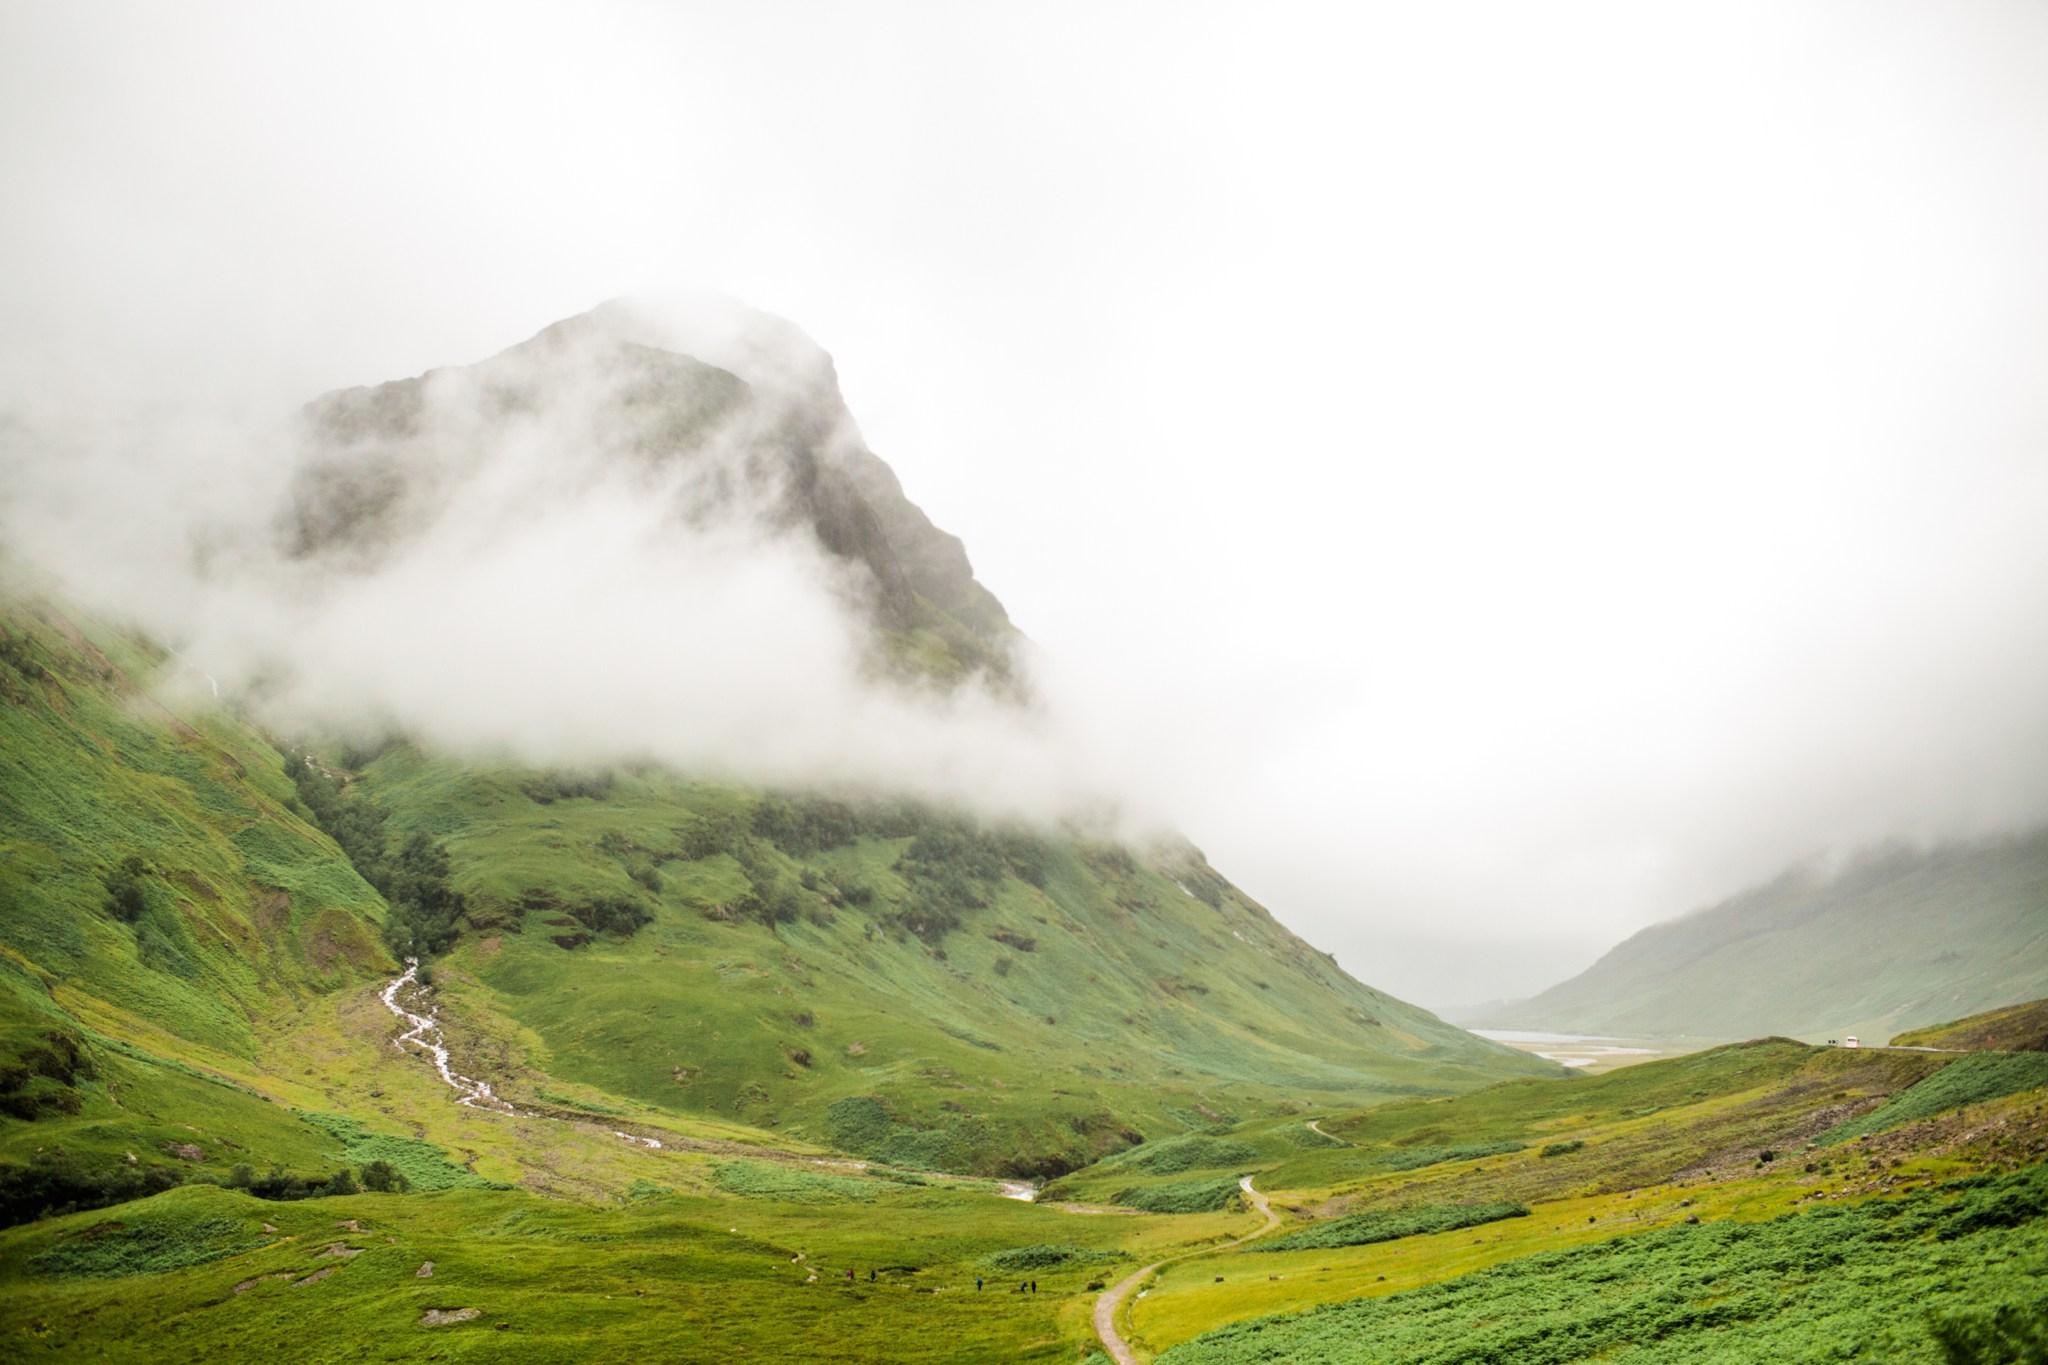 scotland_highlands_deborah_zoe_0034.JPG